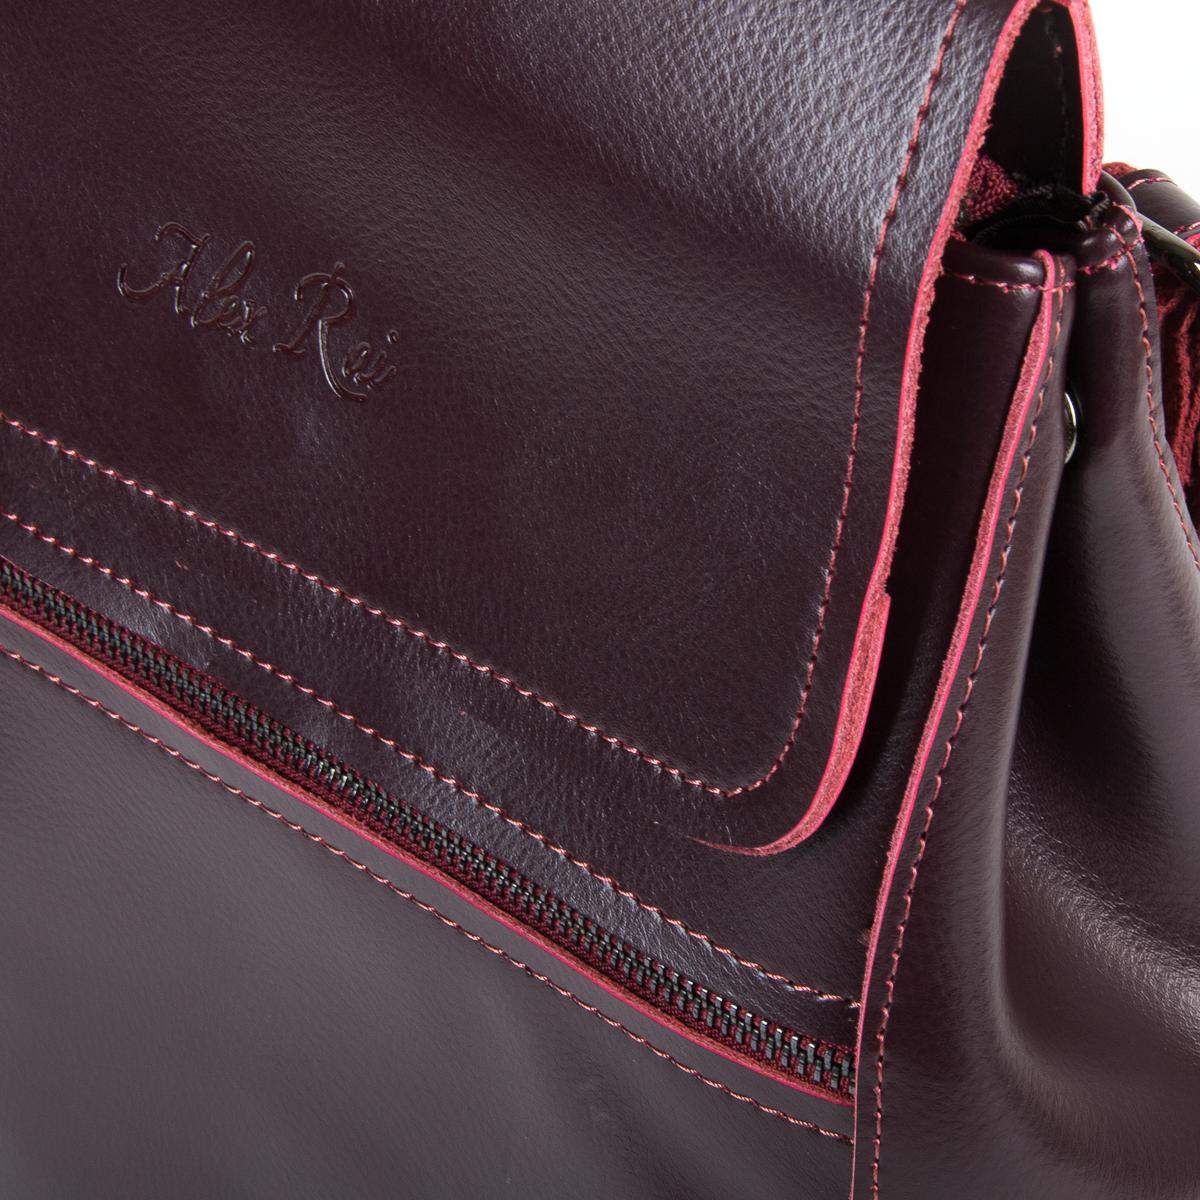 Сумка Женская Рюкзак кожа ALEX RAI 9-01 1005 clared - фото 3